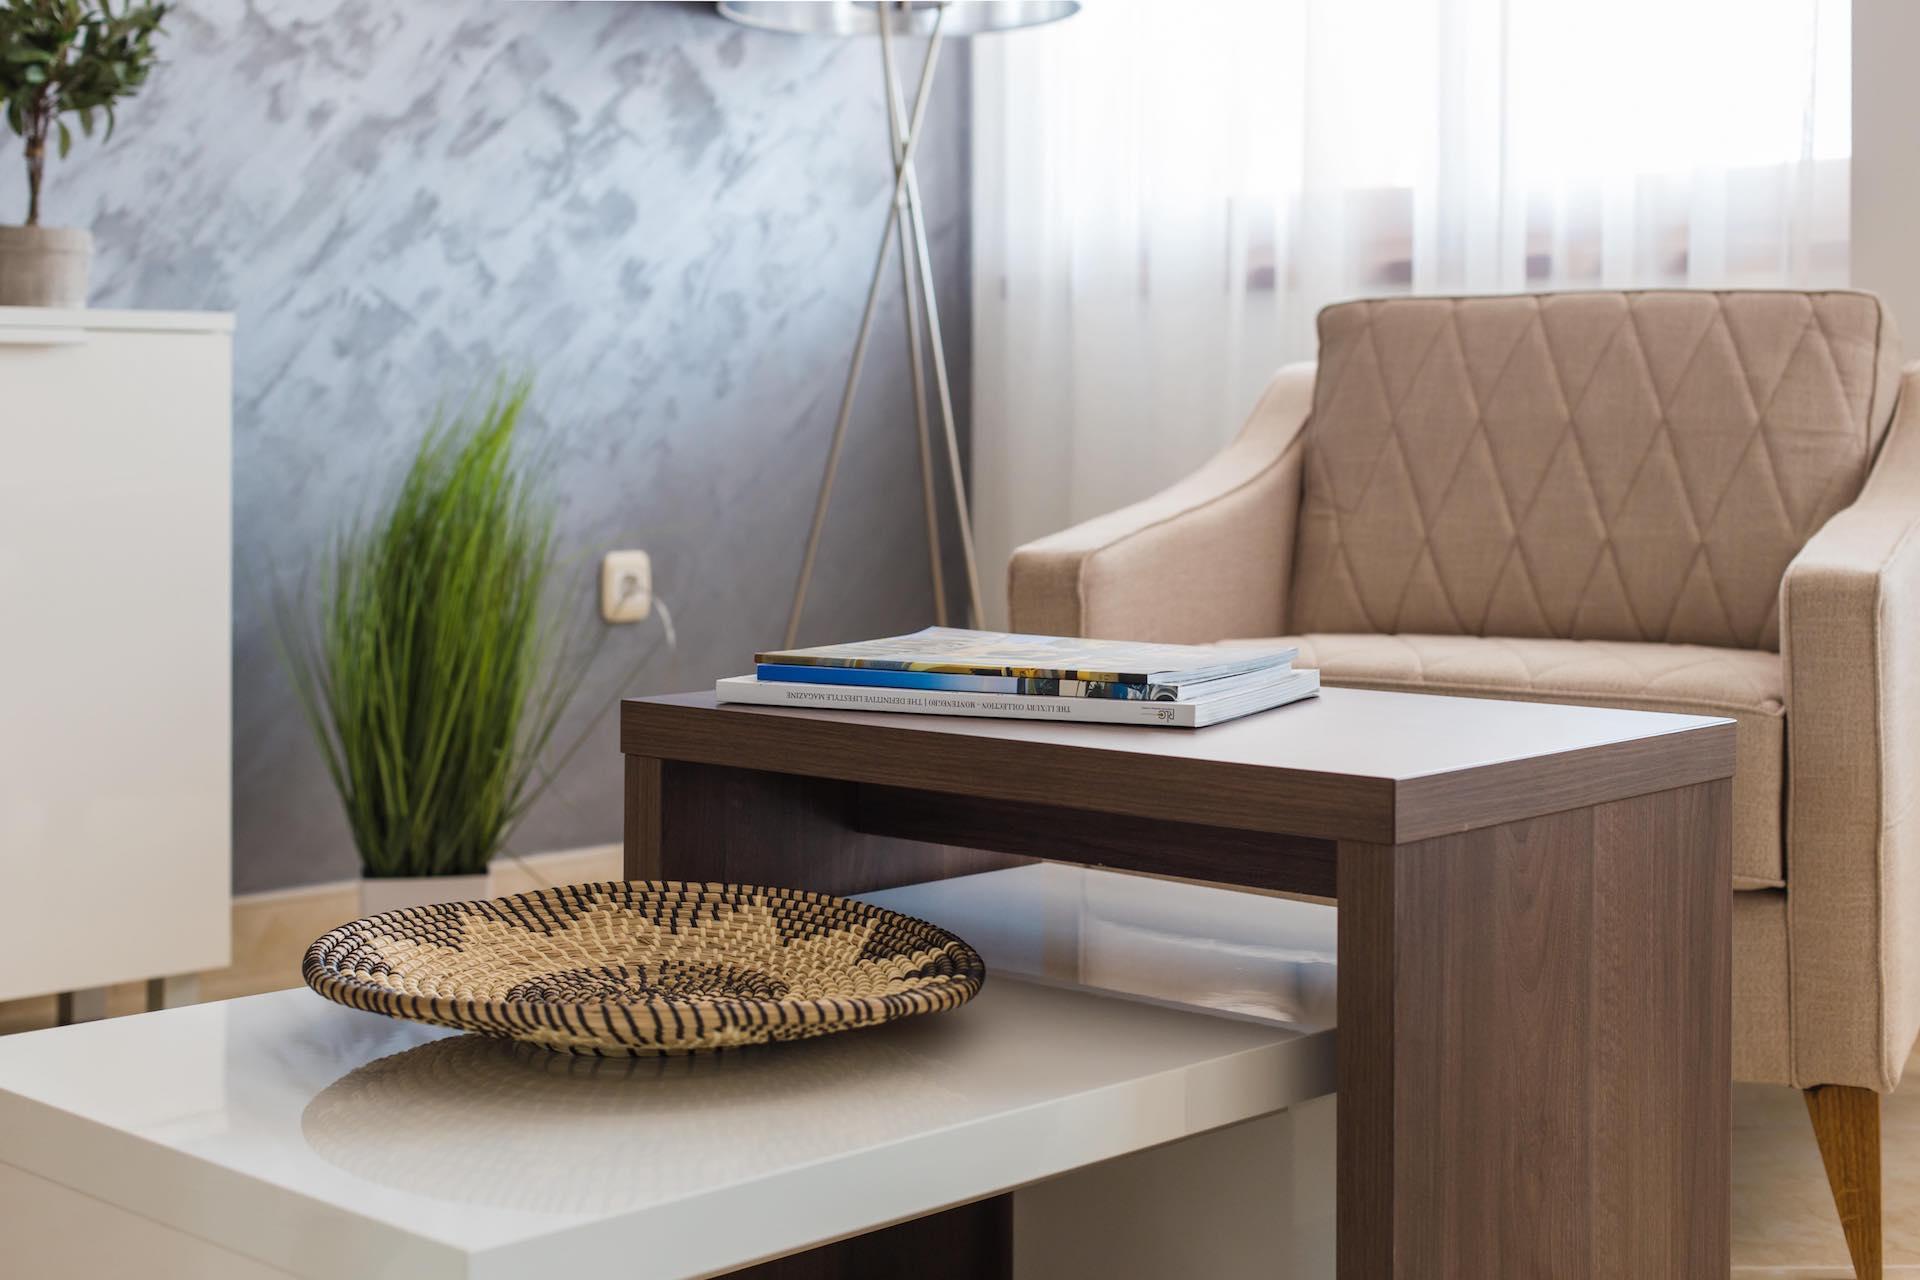 Two Bedroom Apartments Aparthotel Anatolia Becici Budva Montenegro Best Hotel Book Now 17.jpg